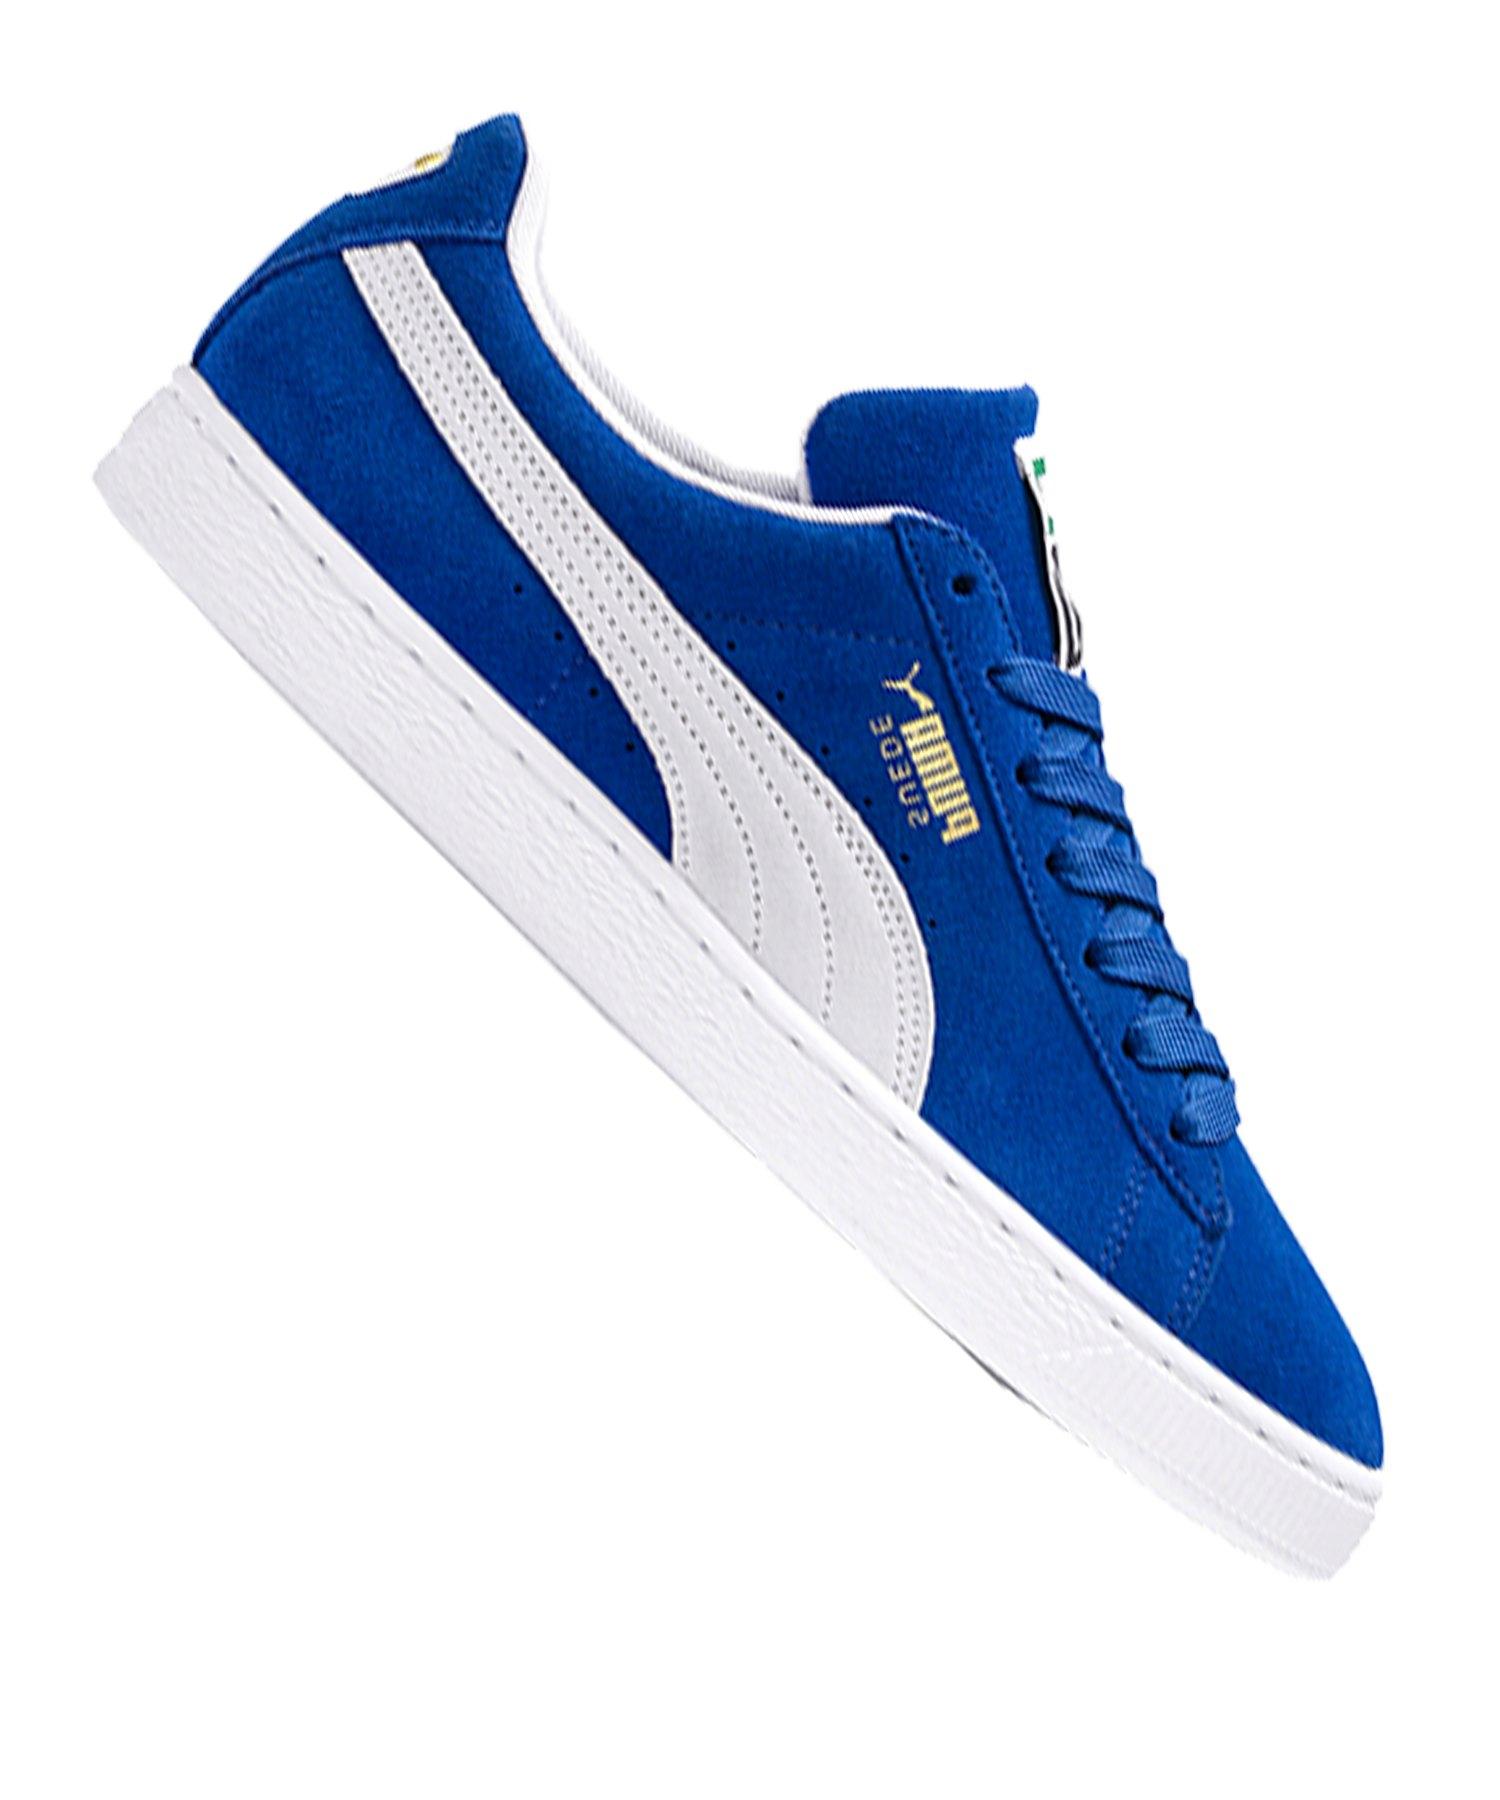 Puma Weiss Classic Sneaker F64 Blau Suede hsBtQrdxC